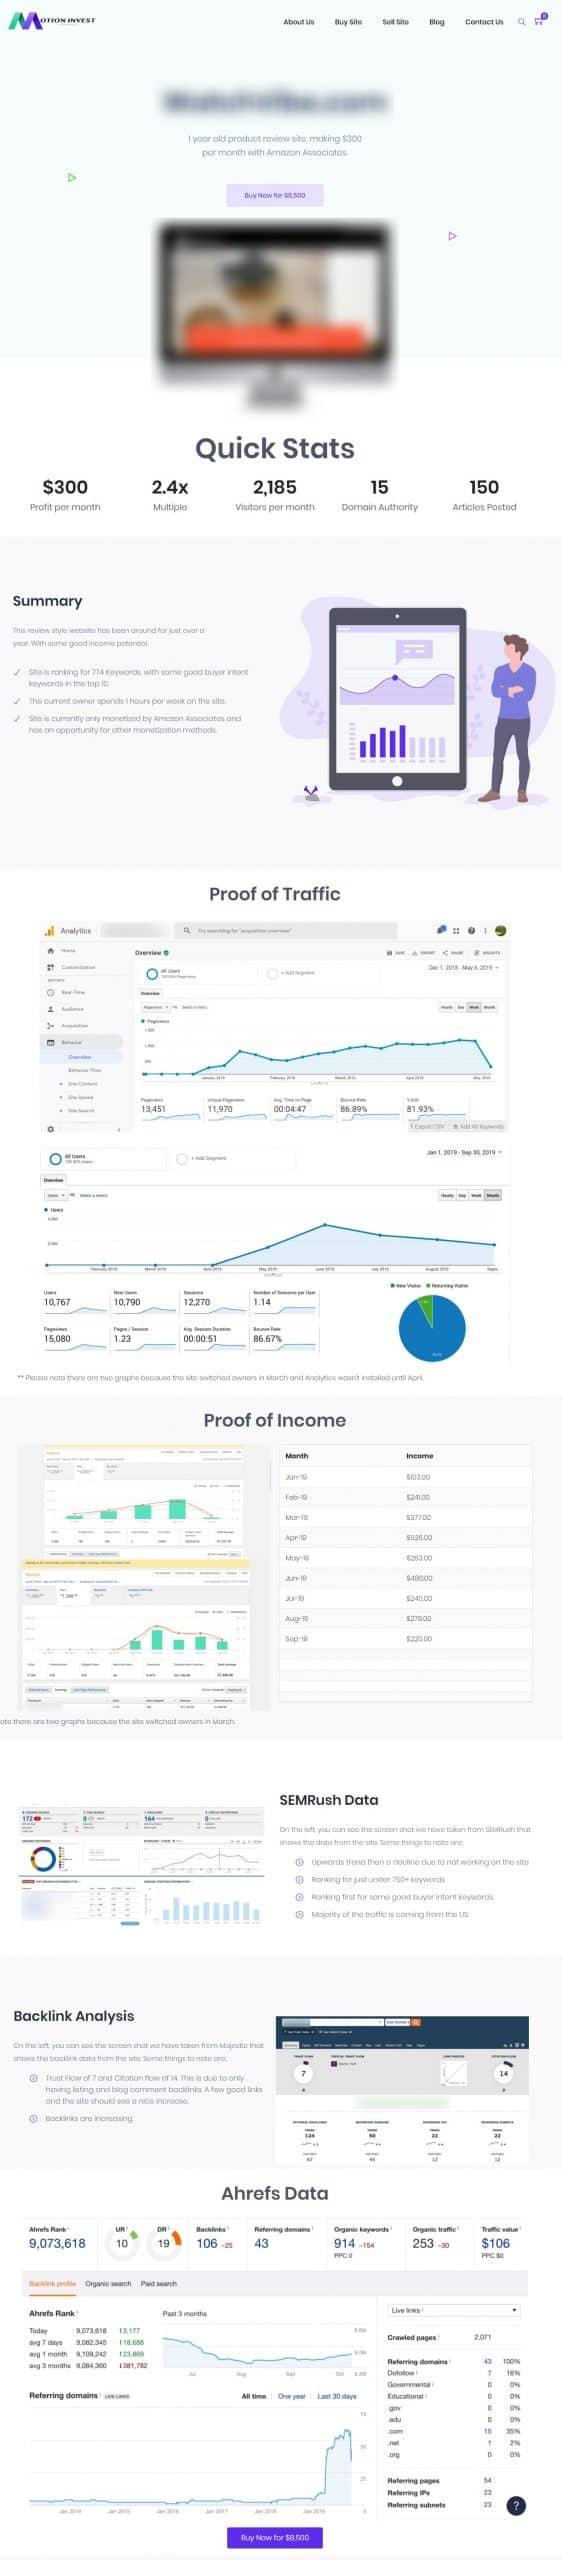 motioninvest auction data